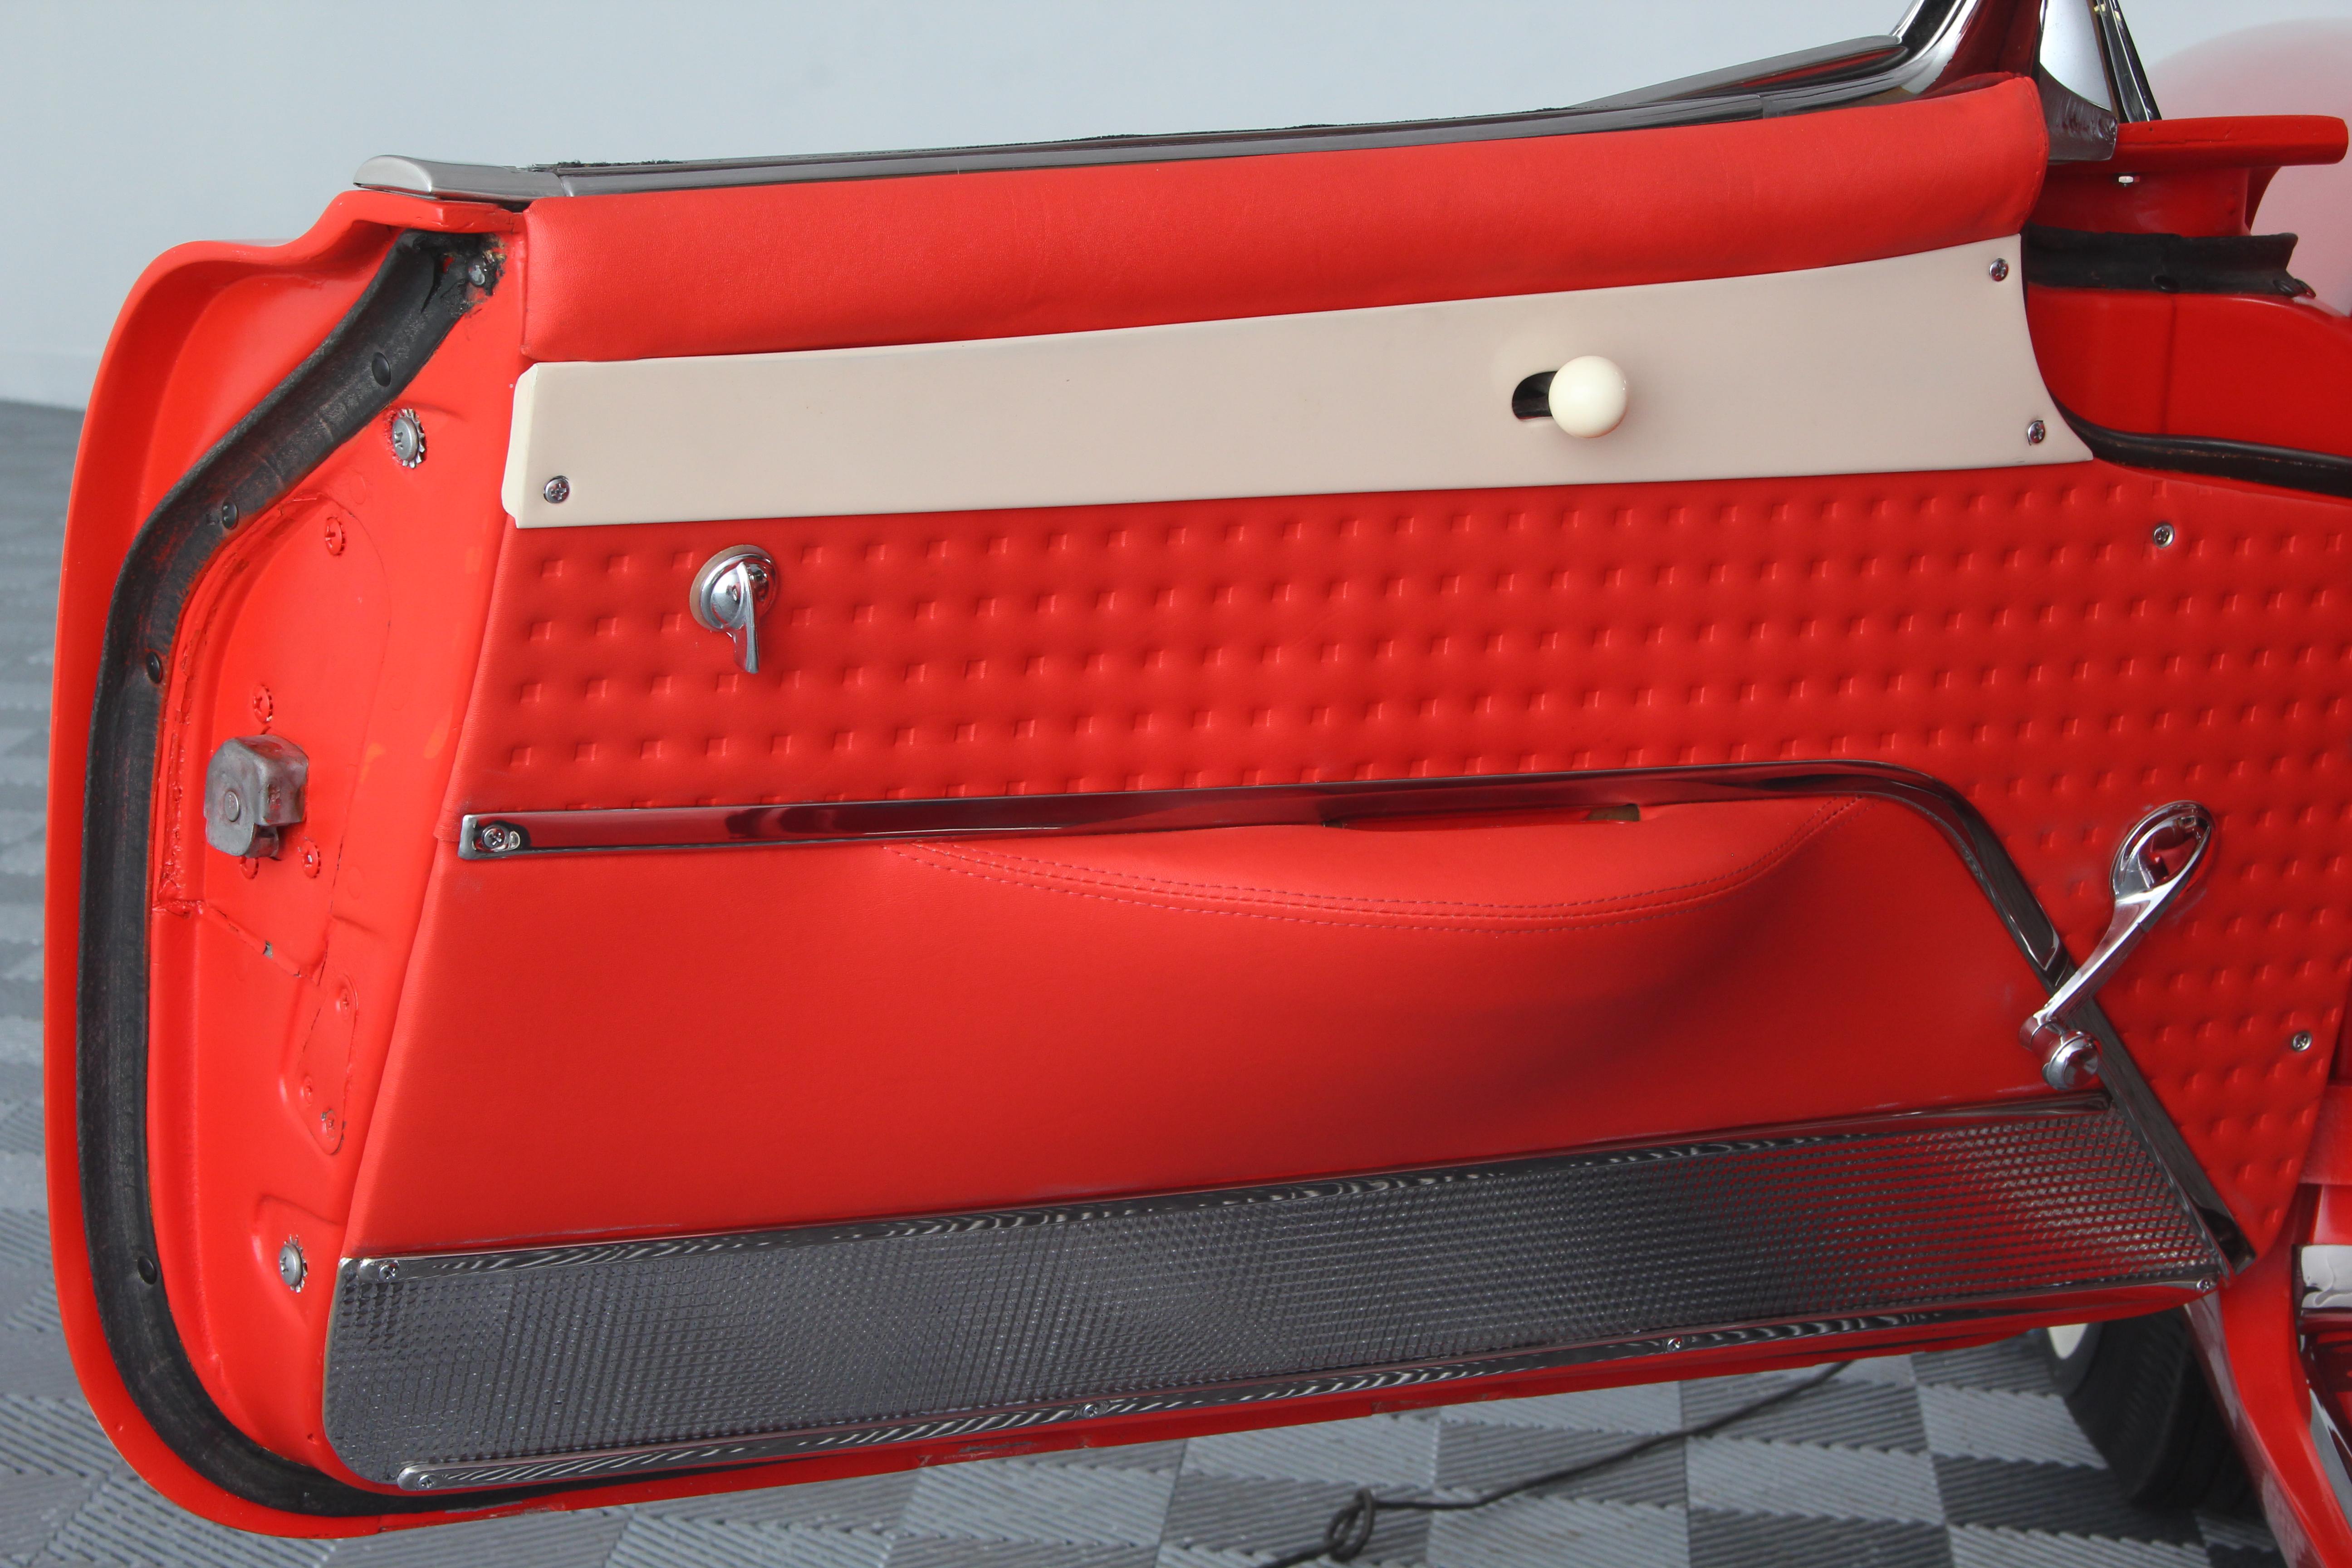 1957 Chevrolet Corvette Elyria Ohio Vin Tag G0017 57 Red Vette 25